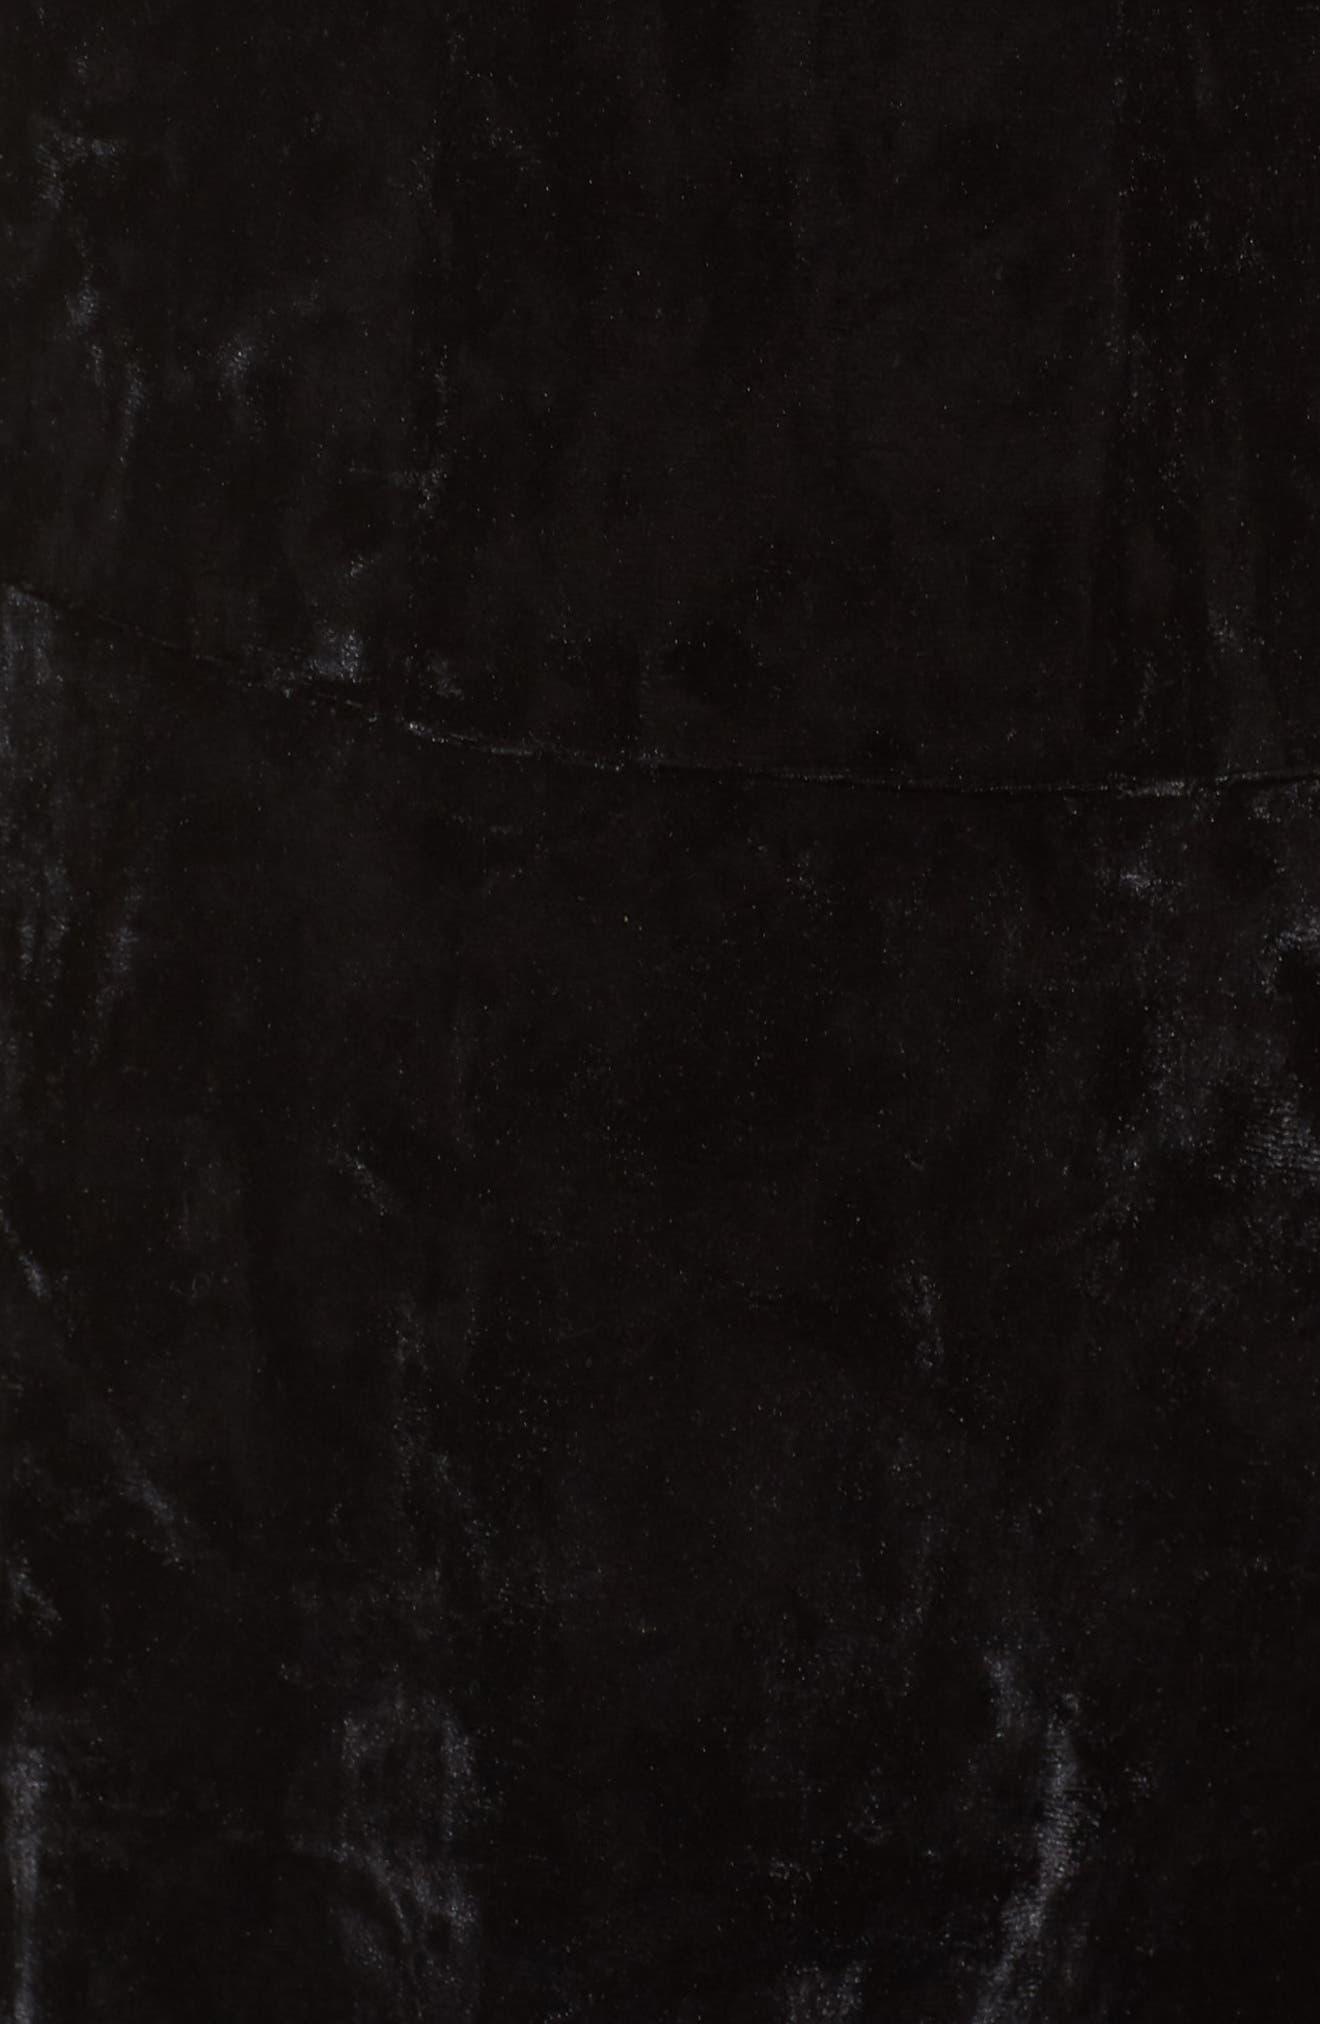 Off the Shoulder Velvet A-Line Dress,                             Alternate thumbnail 6, color,                             BLACK